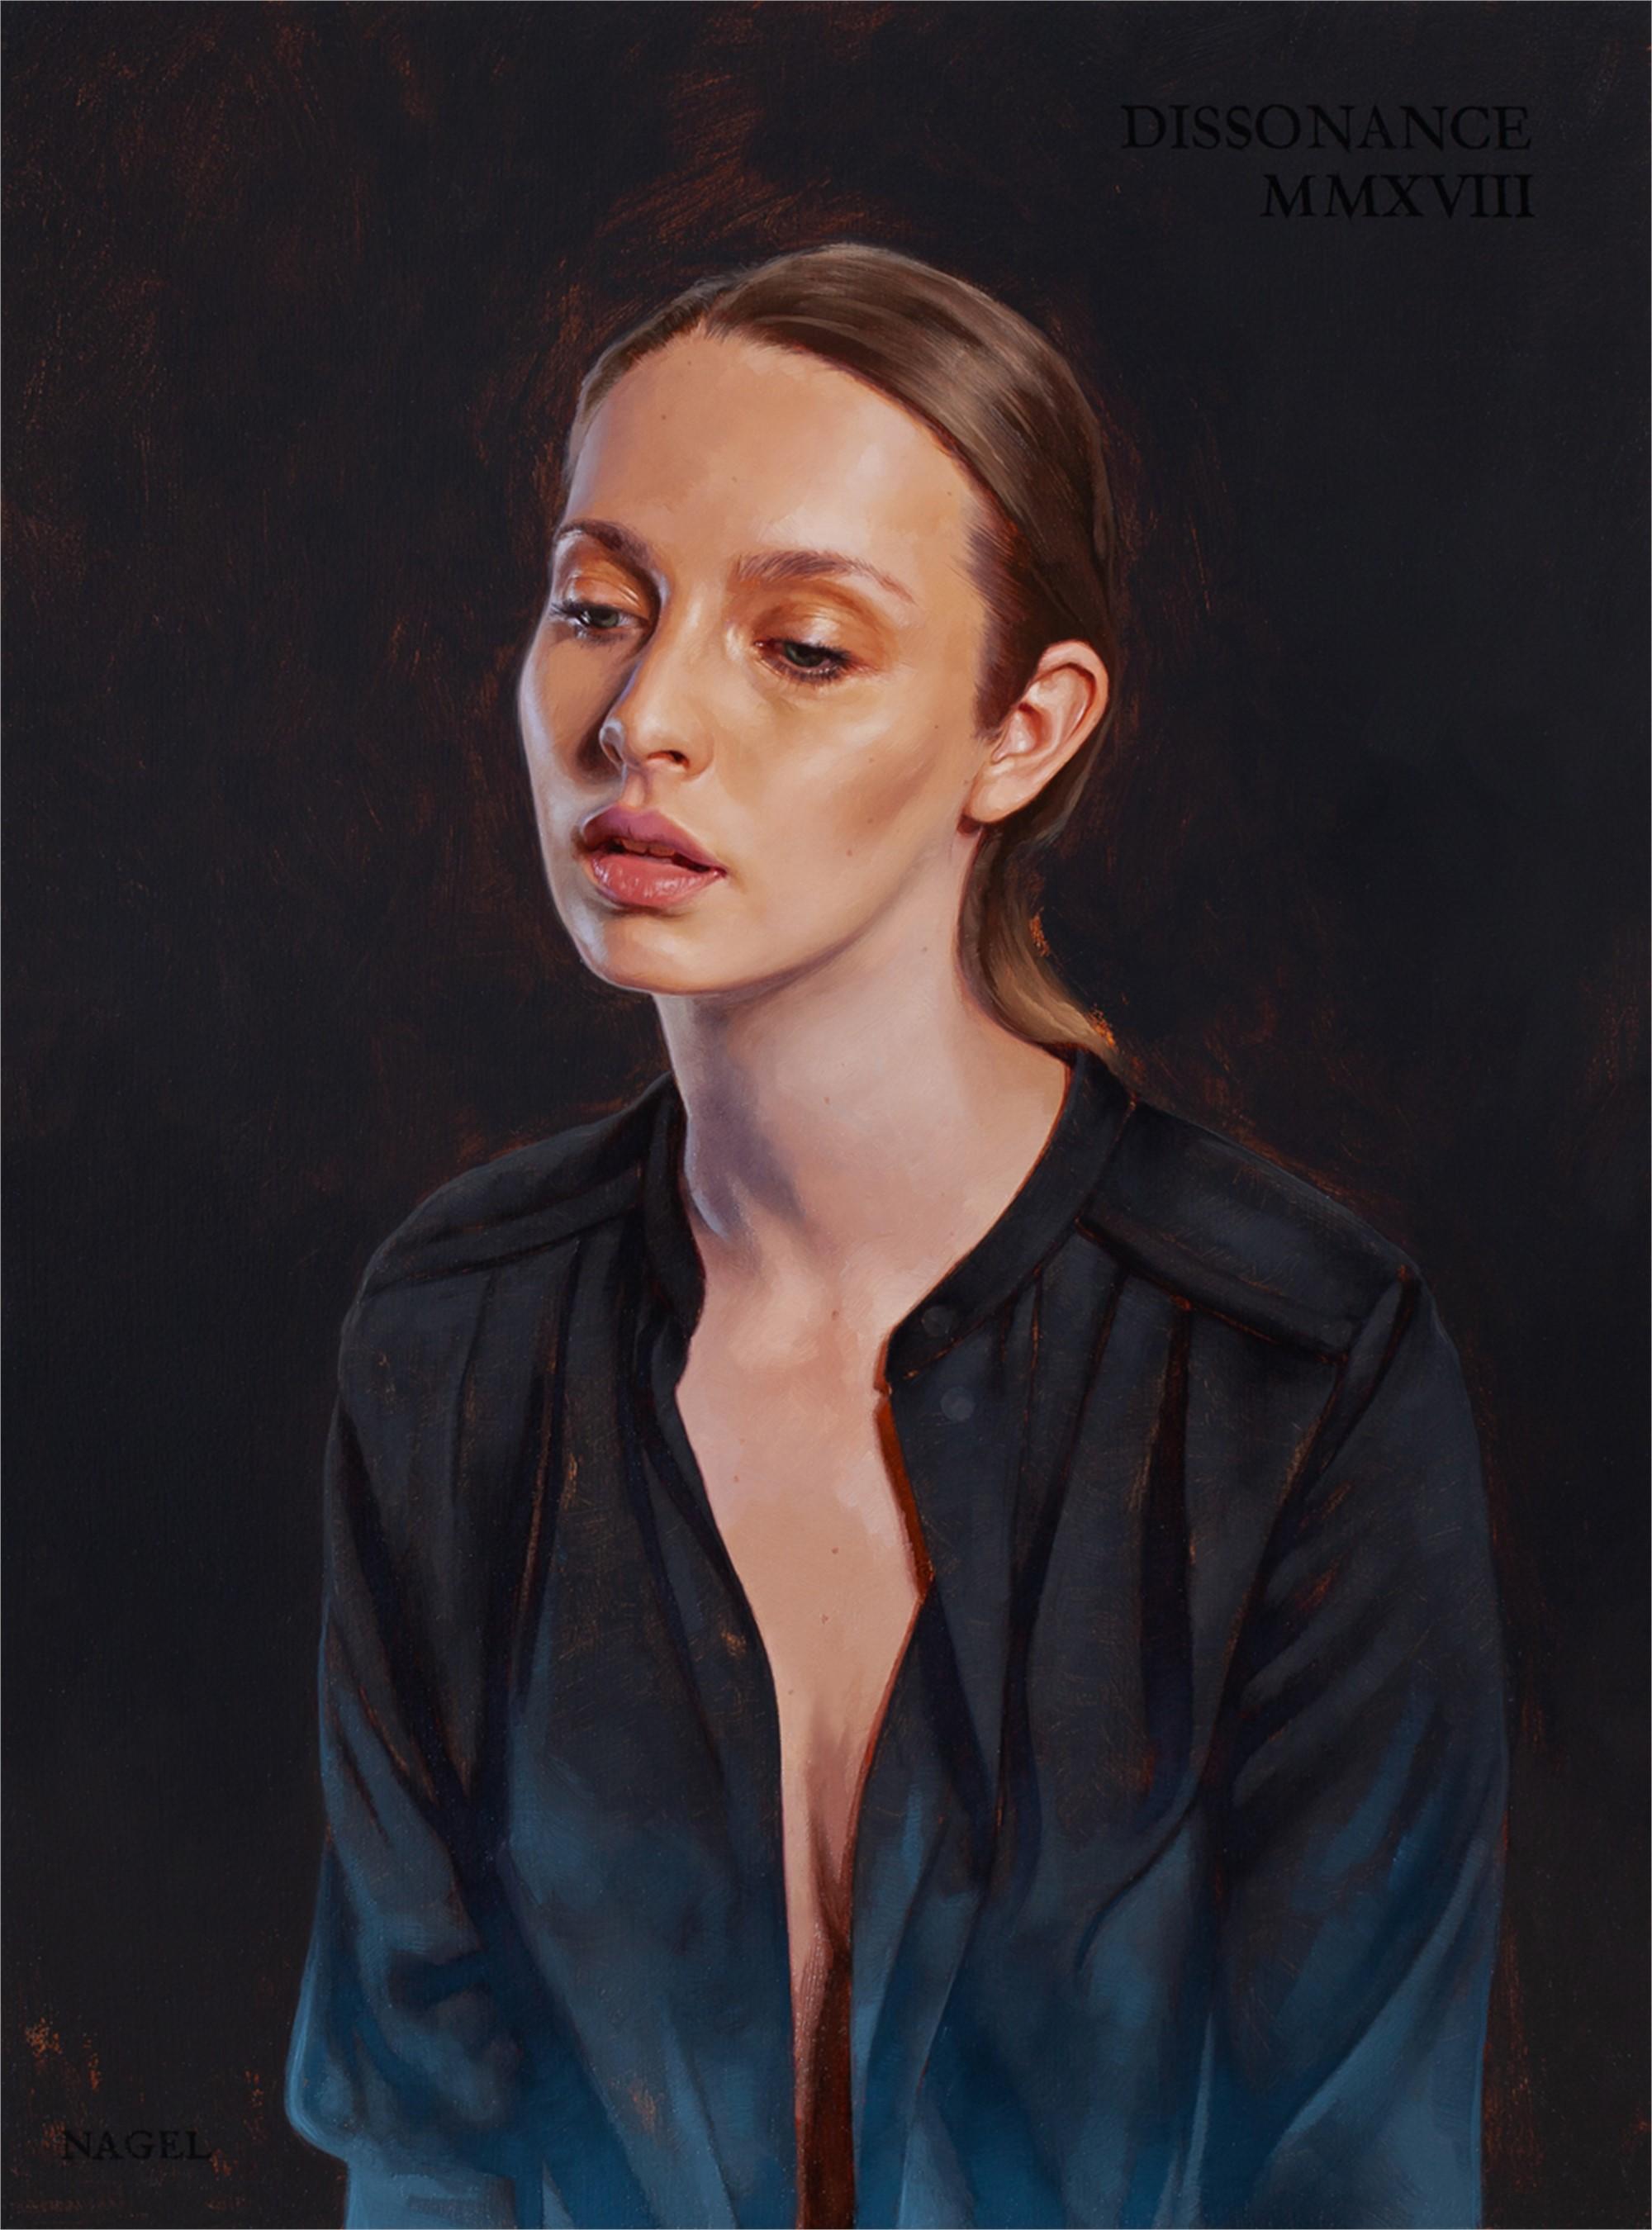 Dissonance by Aaron Nagel